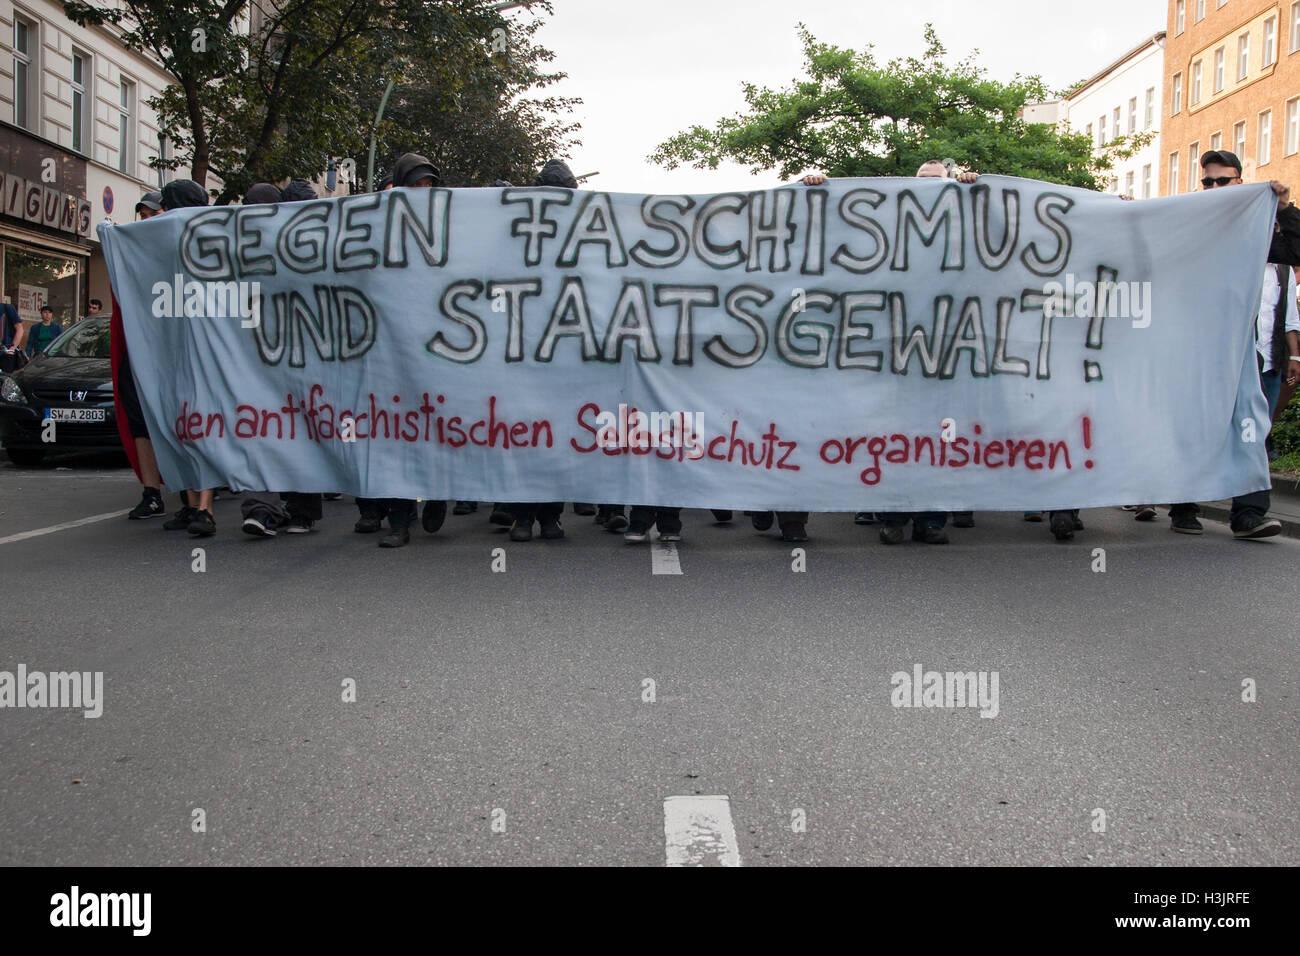 Anti-Fascist Demonstration. Berlin, Germany. Stock Photo